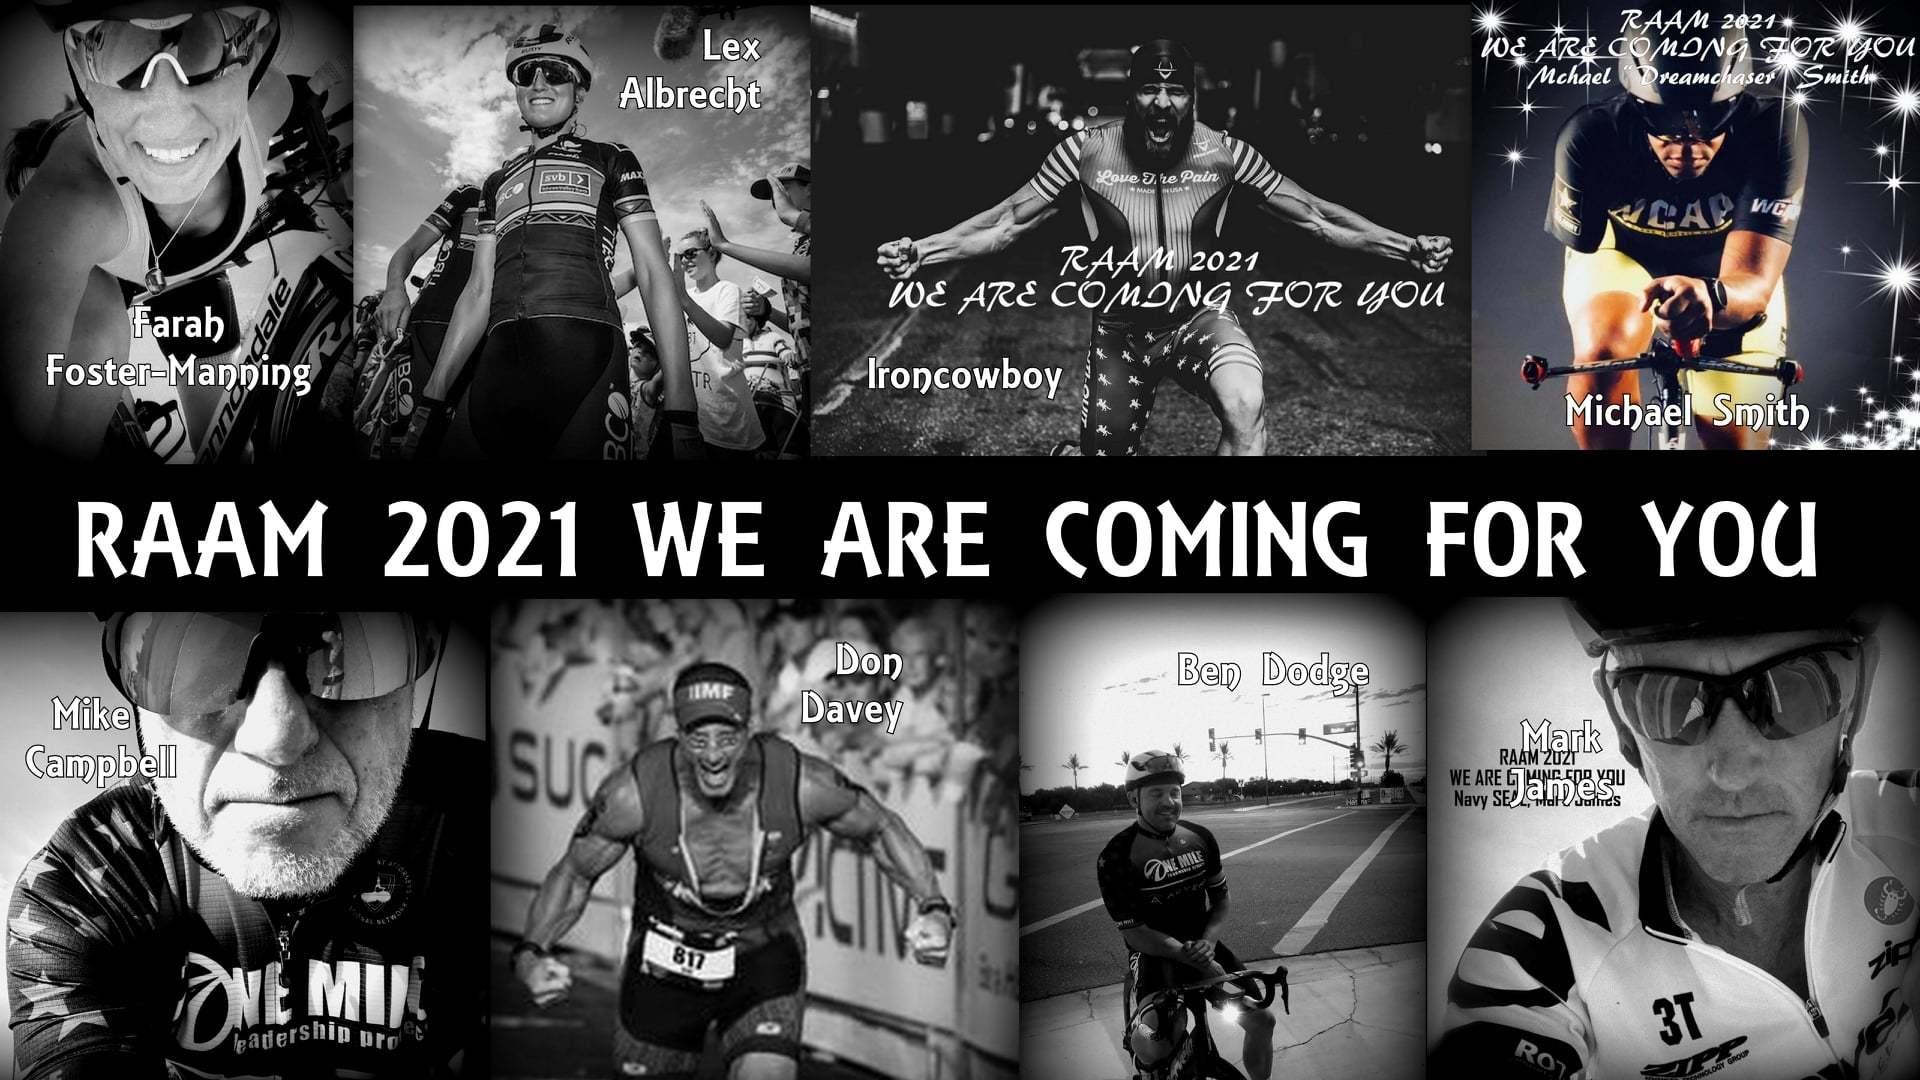 Race Across America 2021, RAAM 8 man team, Team One Mile, Lex Albrecht RAAM